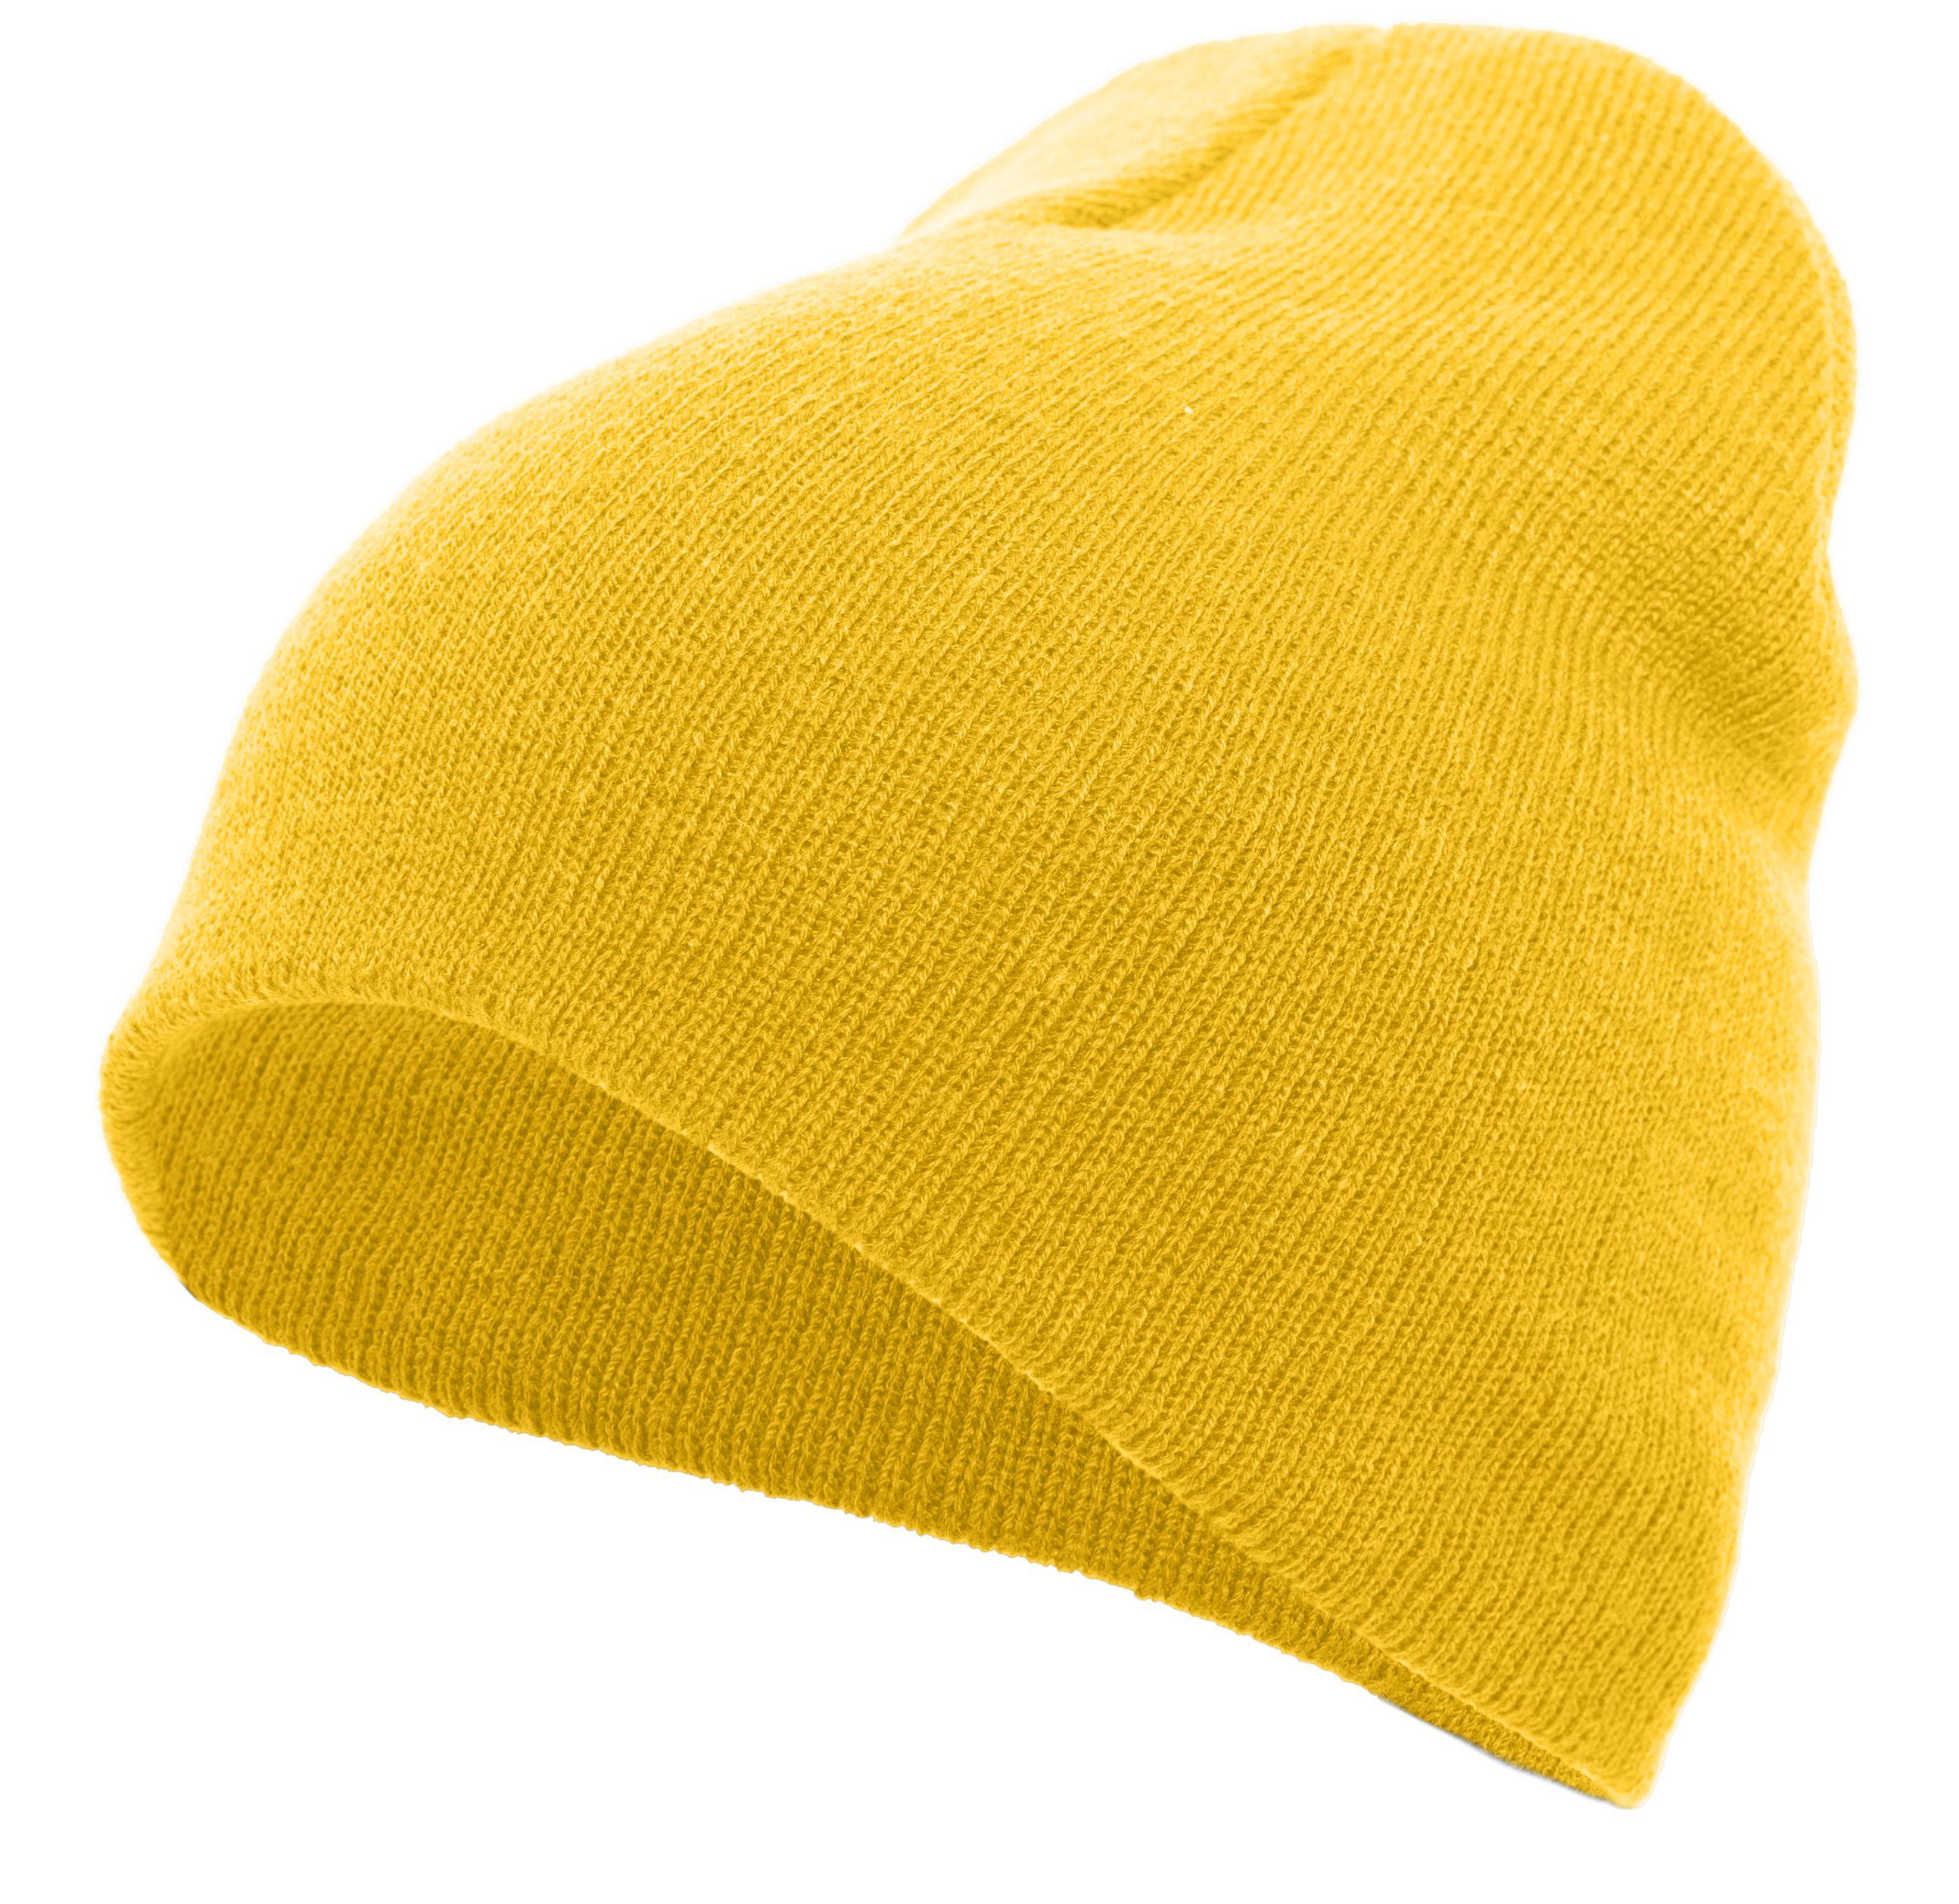 Basic Knit Beanie - GOLD